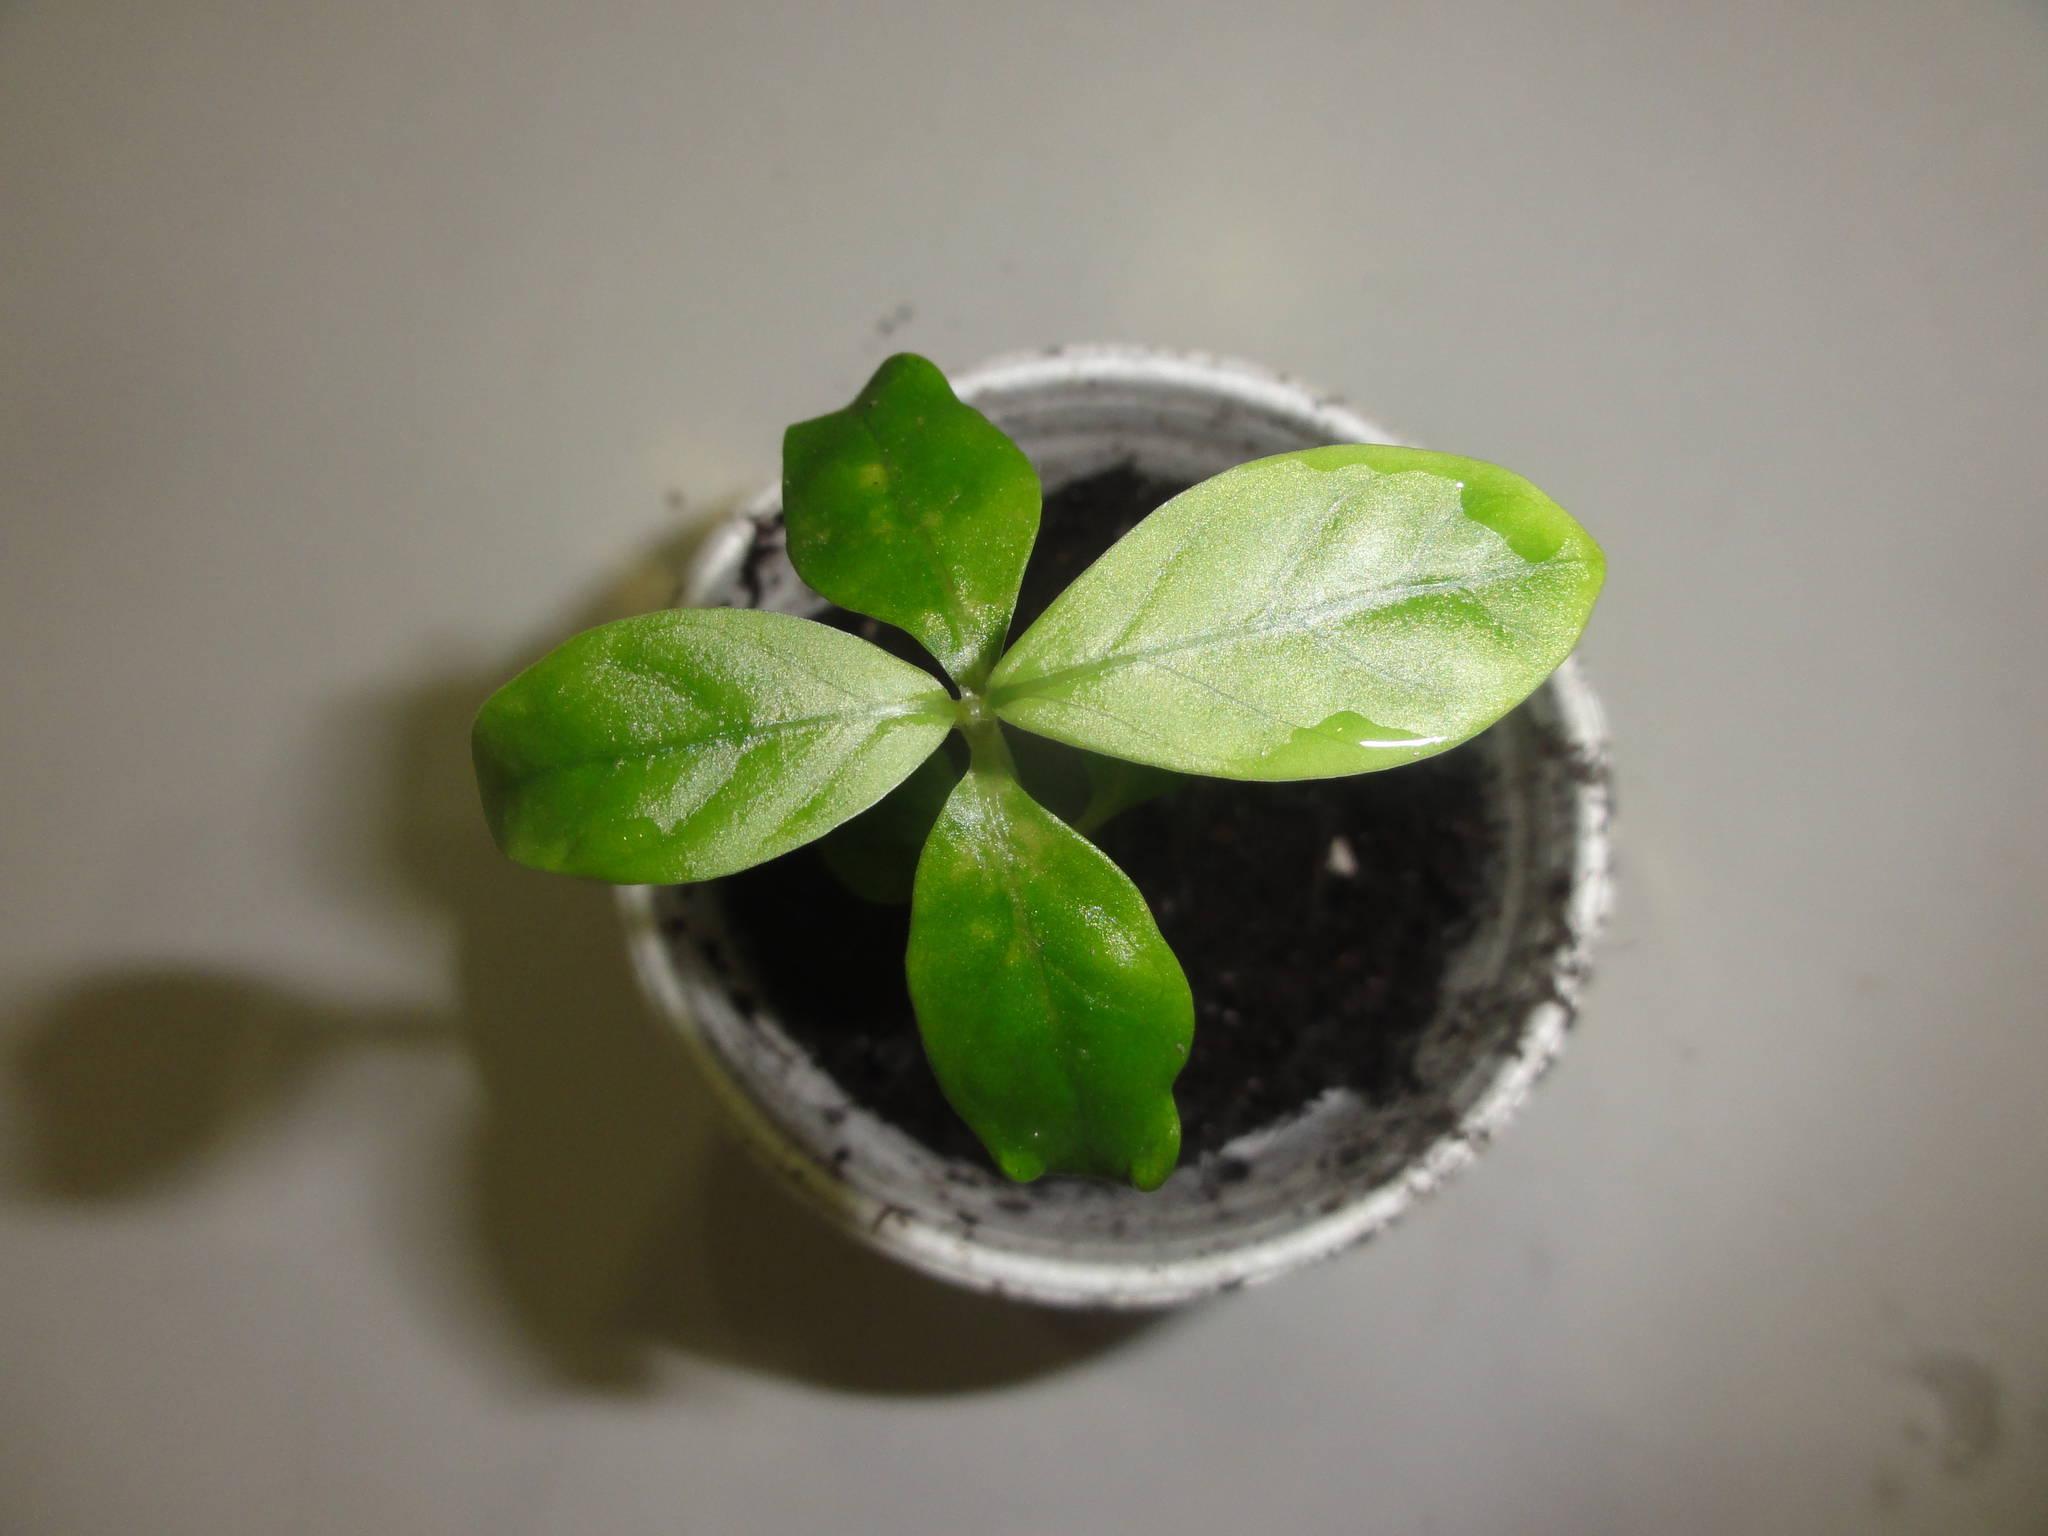 Psychotria Alba vs Viridis Psychotria Viridis to Show